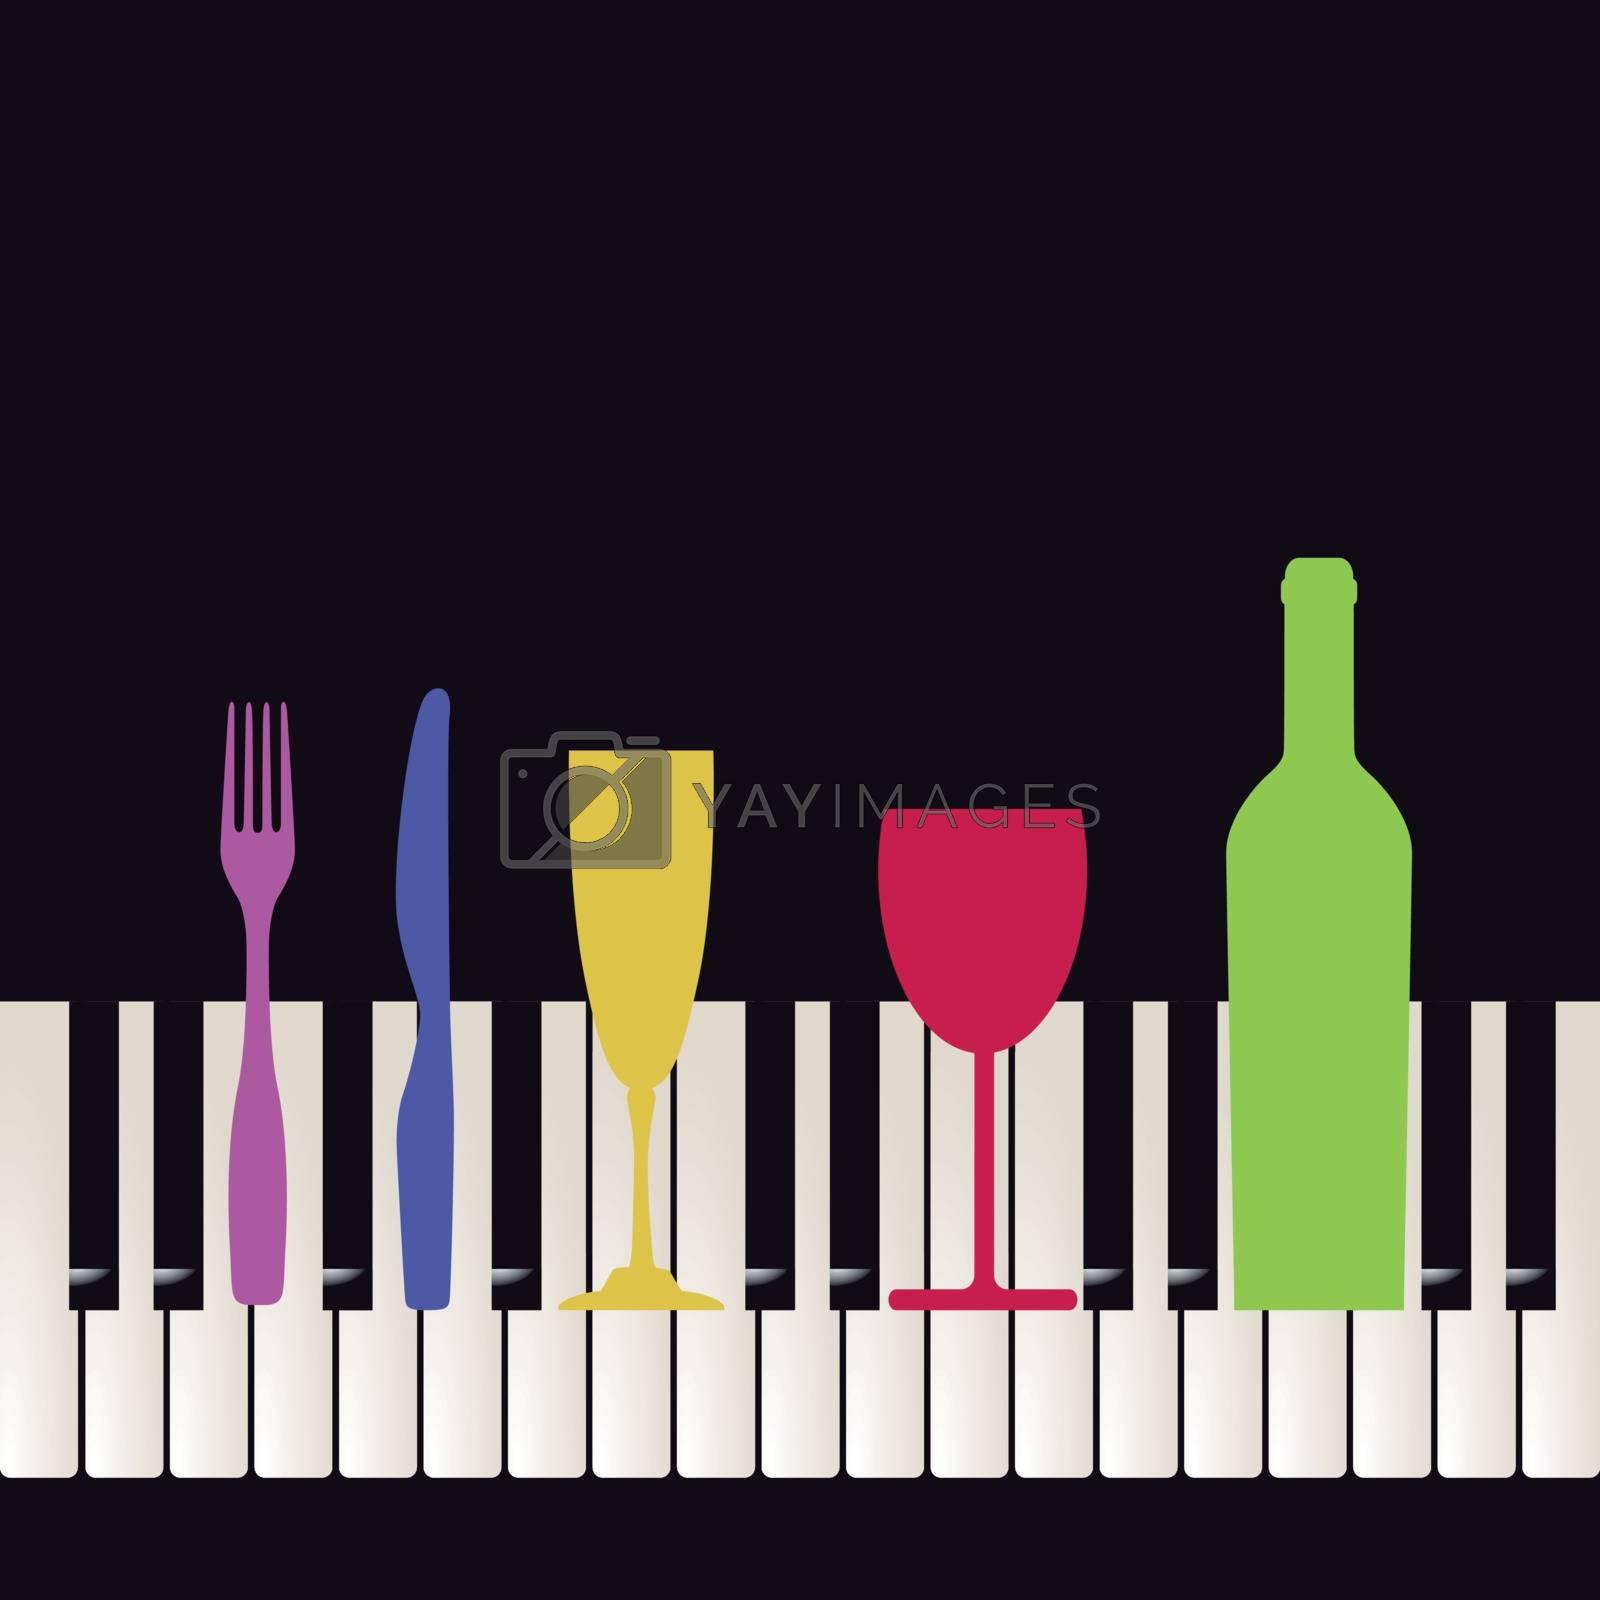 Piano bar event